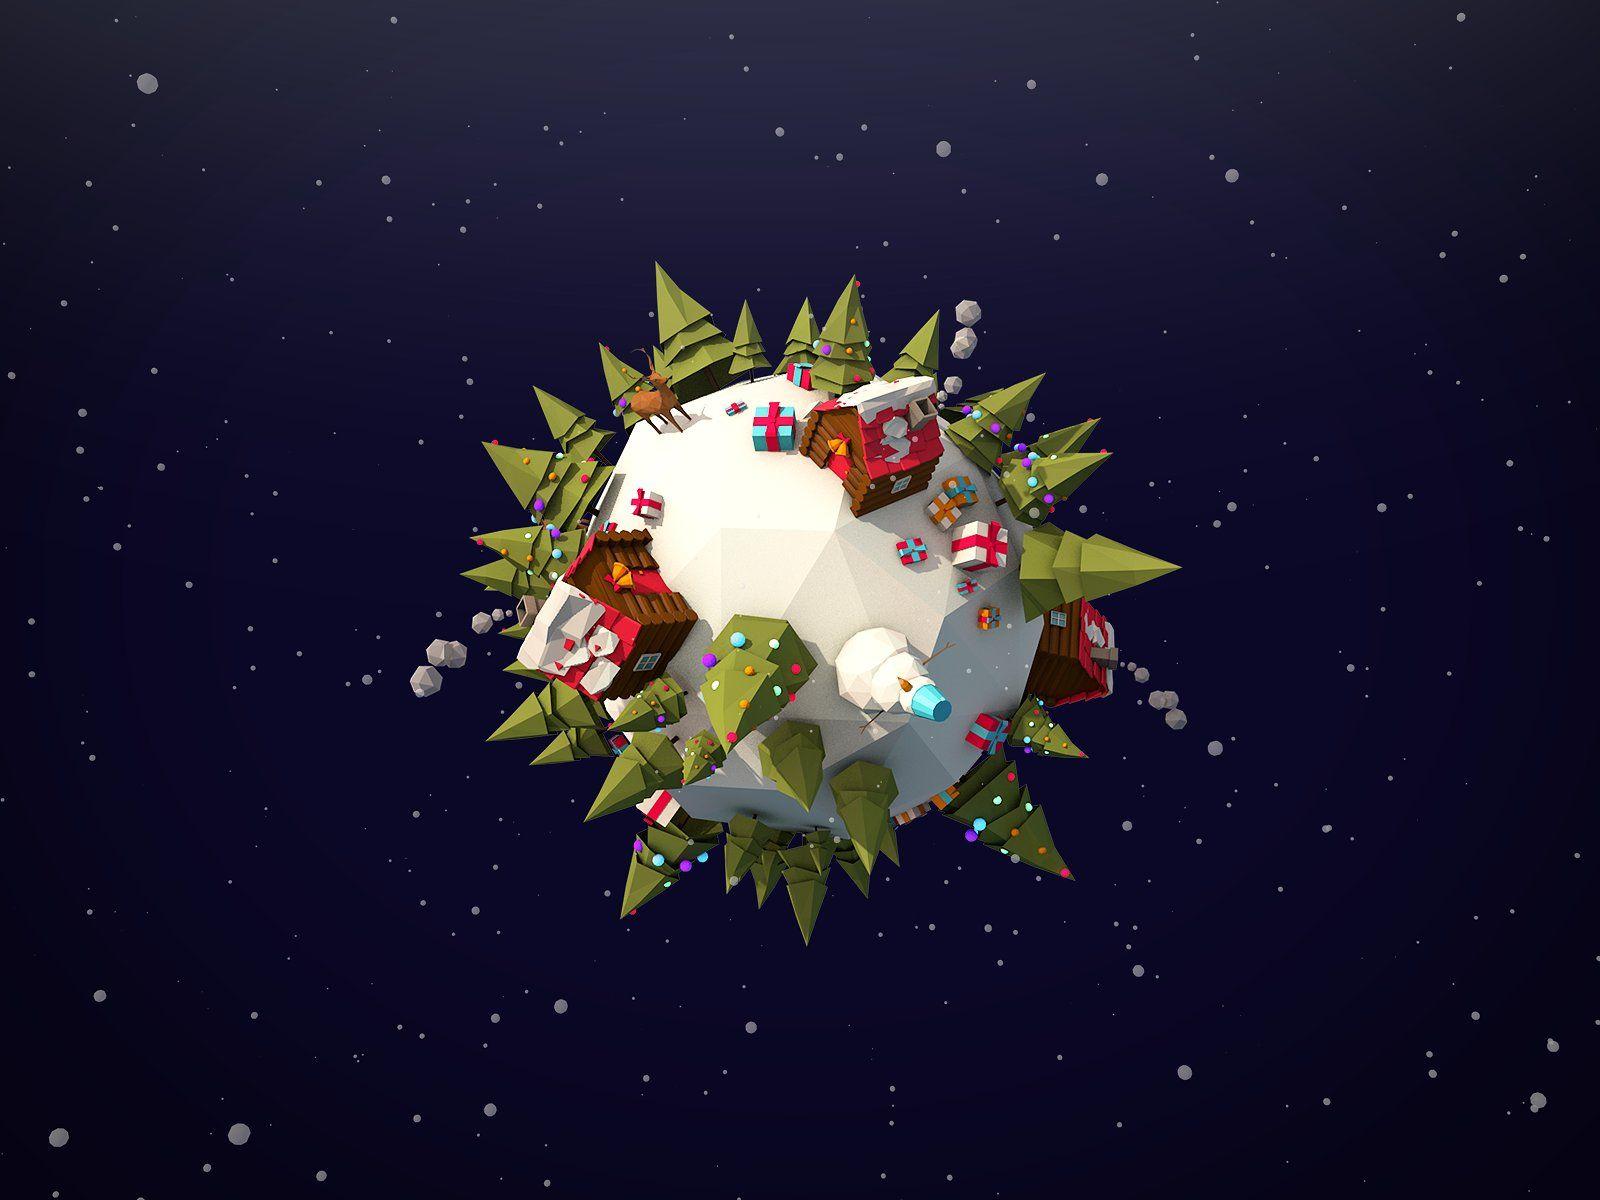 Winter Asset Digital illustration, Christmas